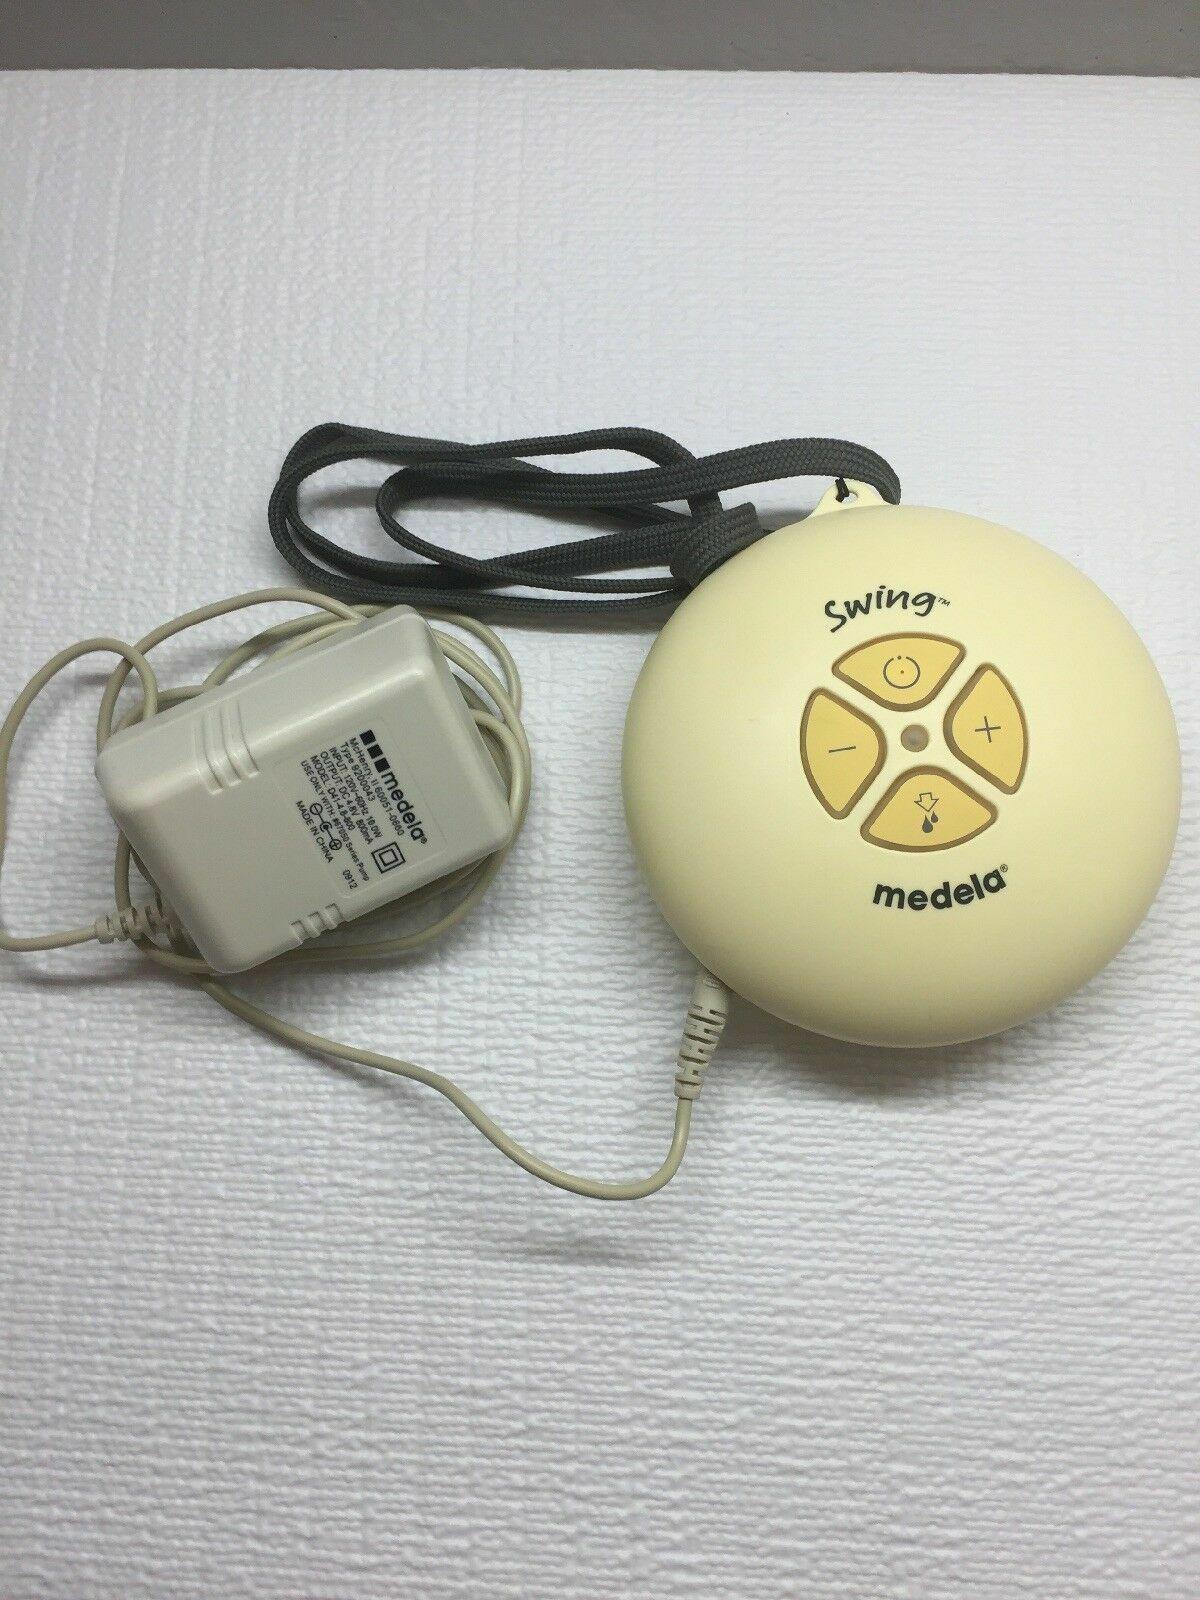 Medela Swing Double Electric Breastpump For Sale Online Ebay